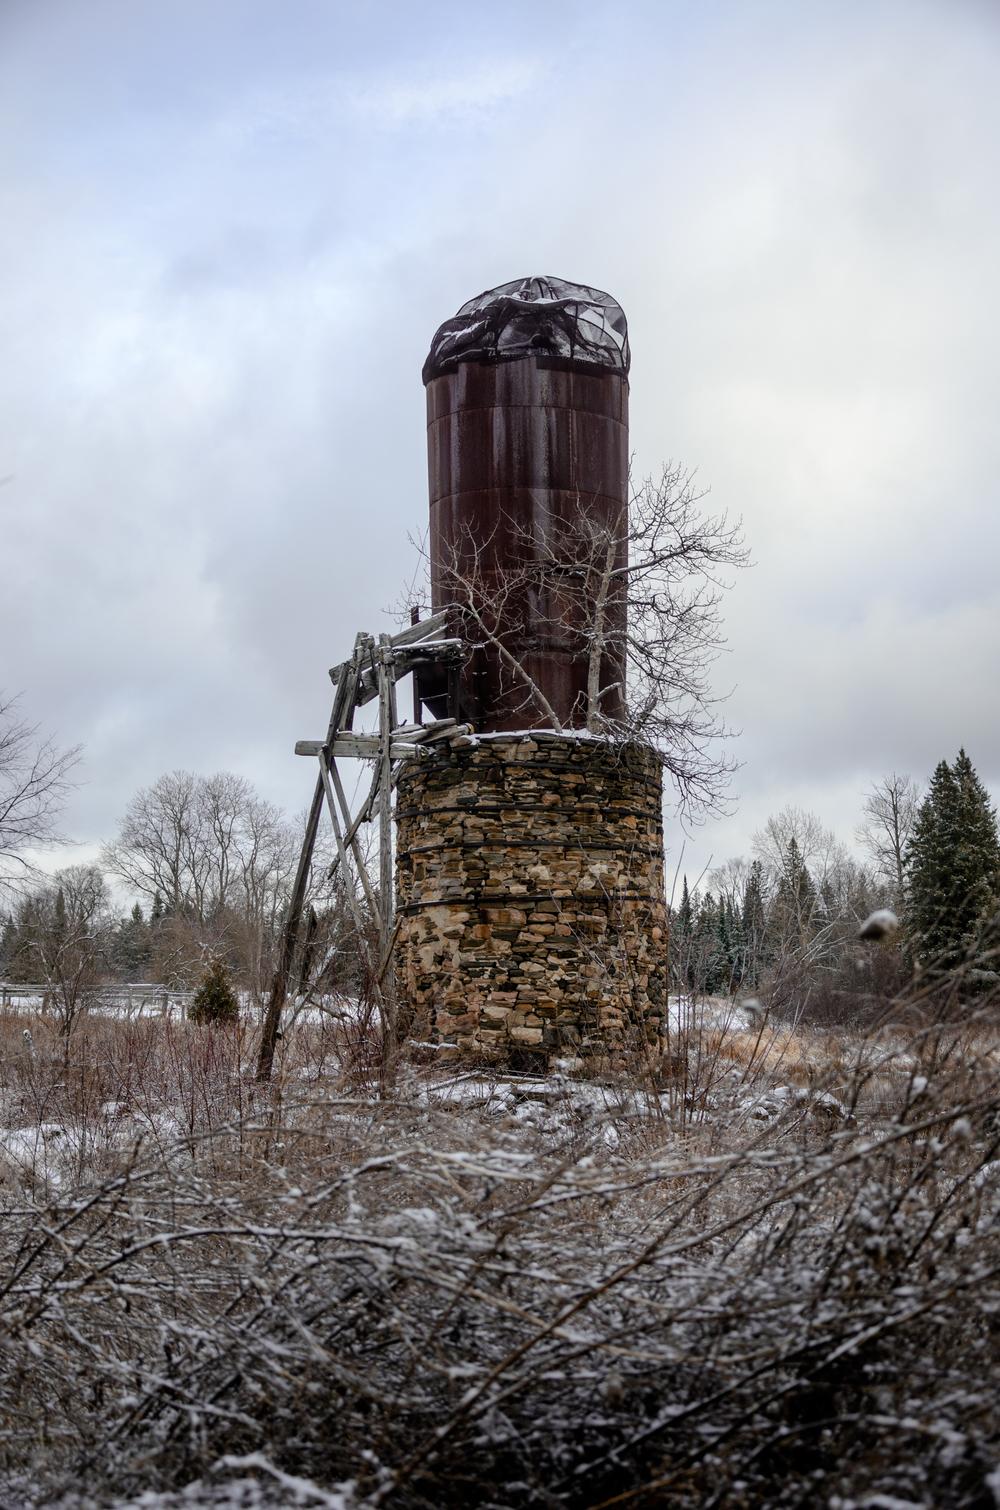 Jenkins, Cheyenne. Sawdust Burner. 2016. Digital Photography. Balaclava, Ontario